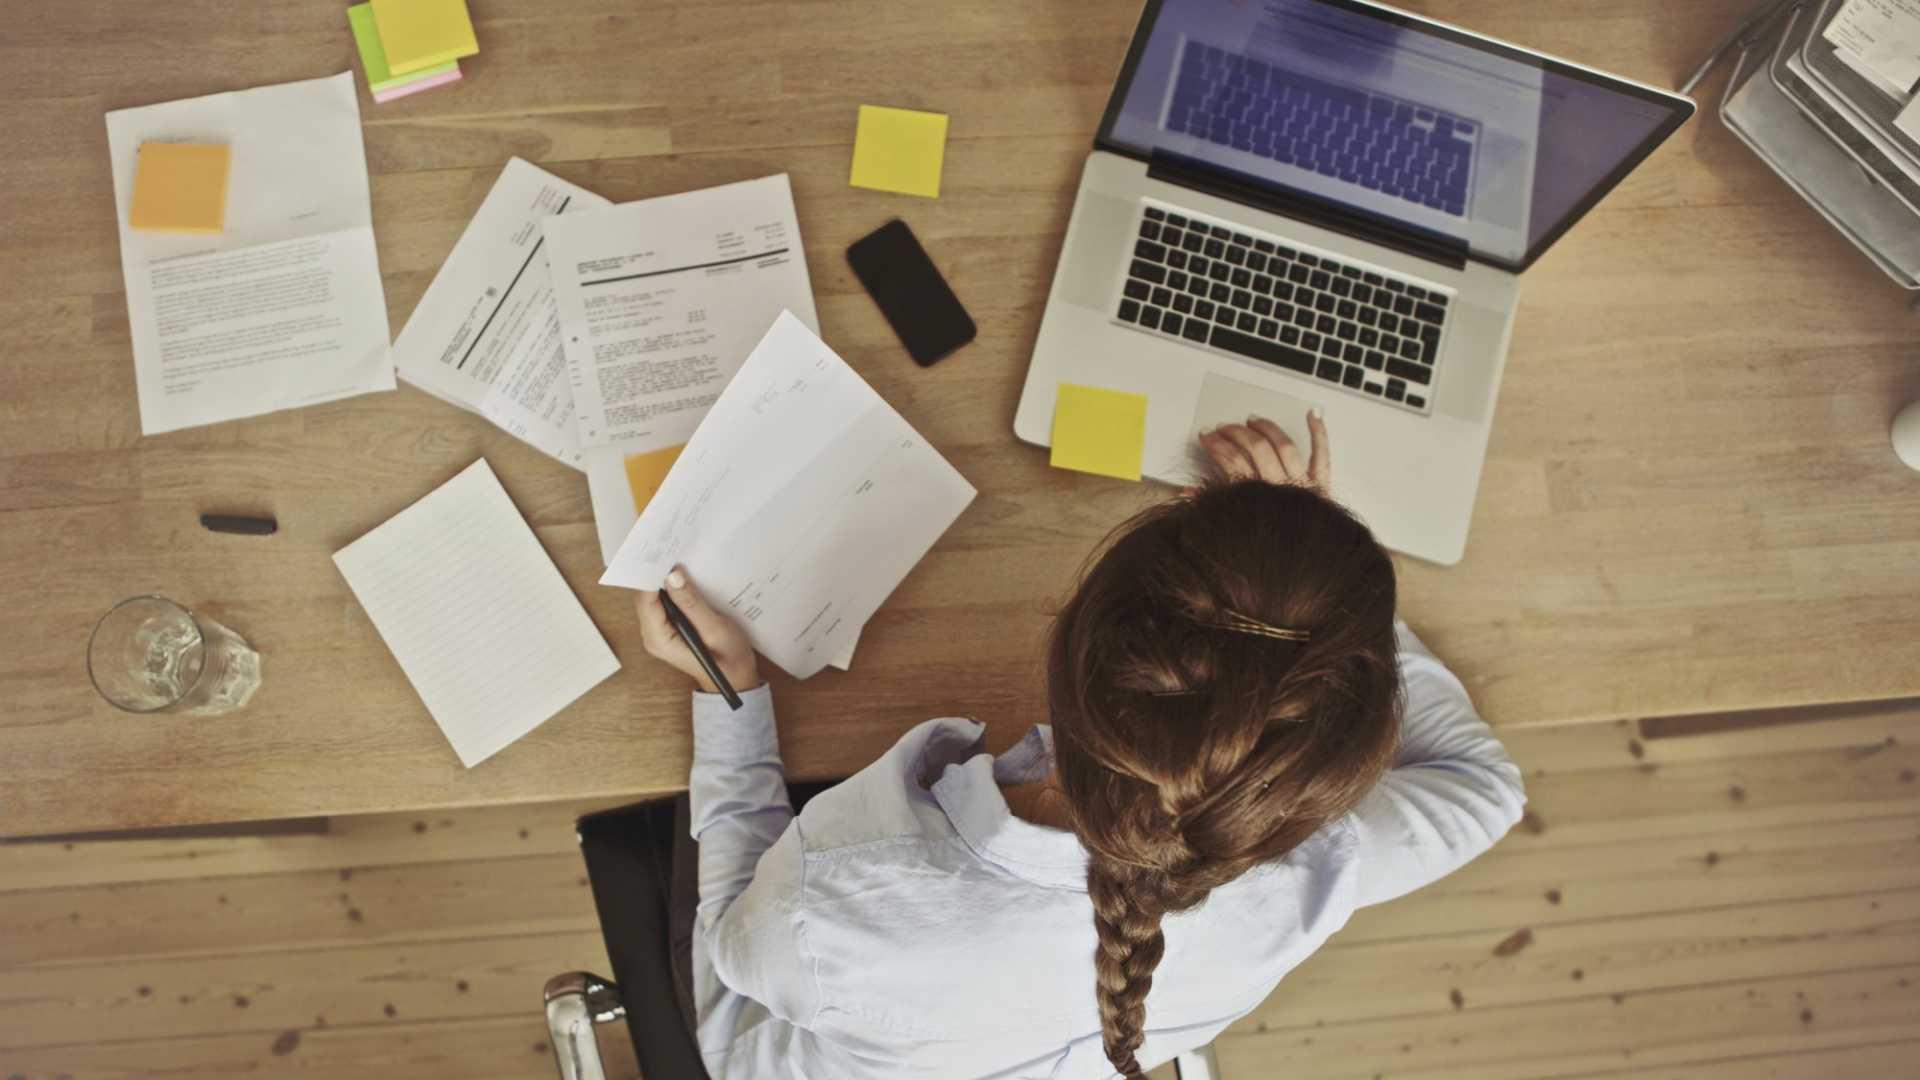 7 Harsh Truths That Will Make You a Better Entrepreneur